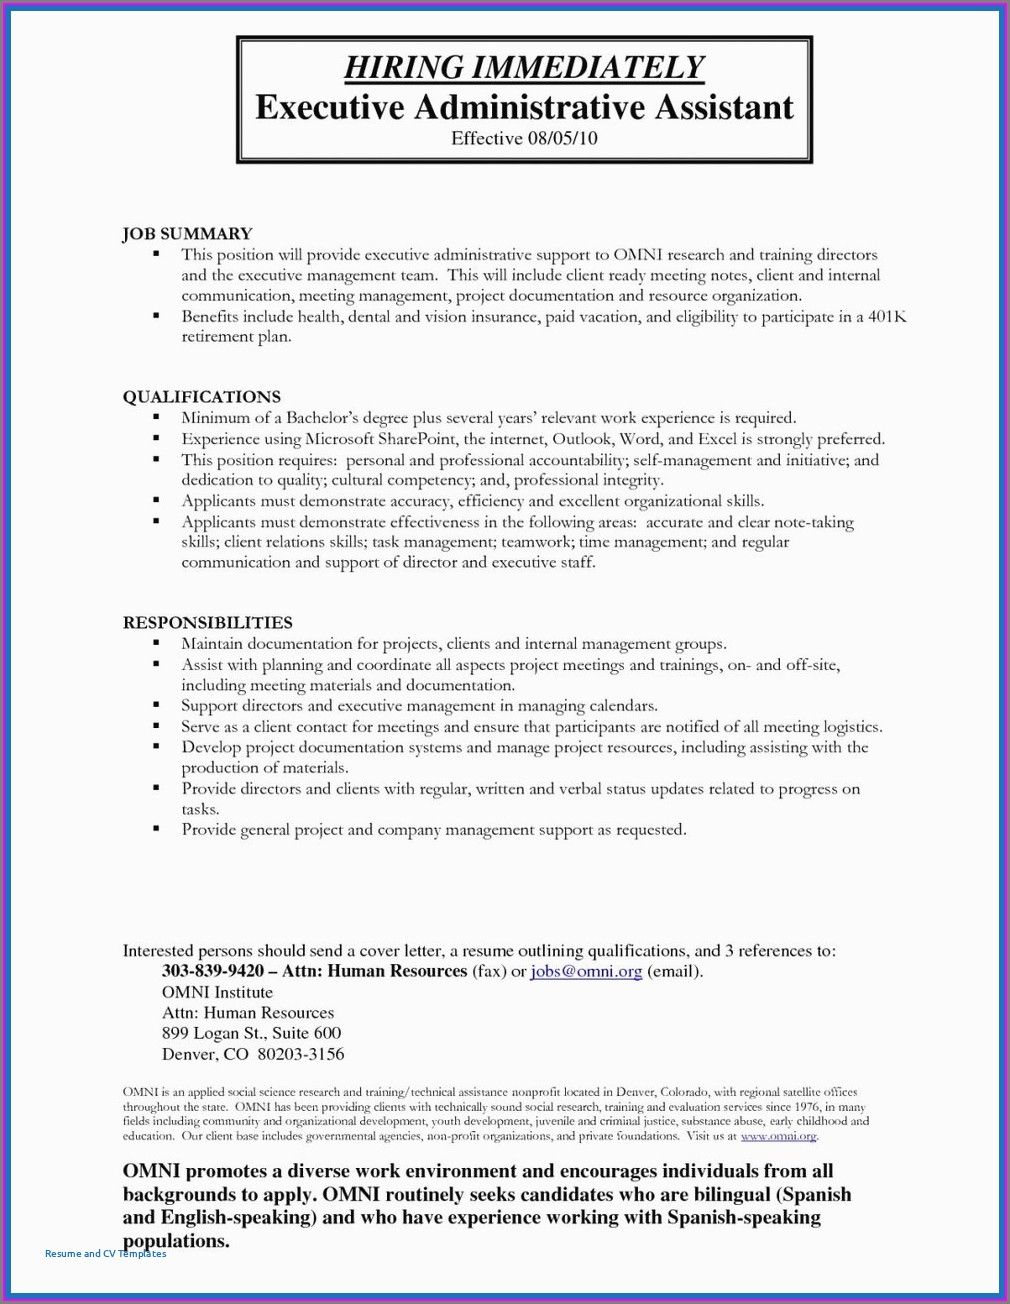 Executive Resume Writing Service Los Angeles